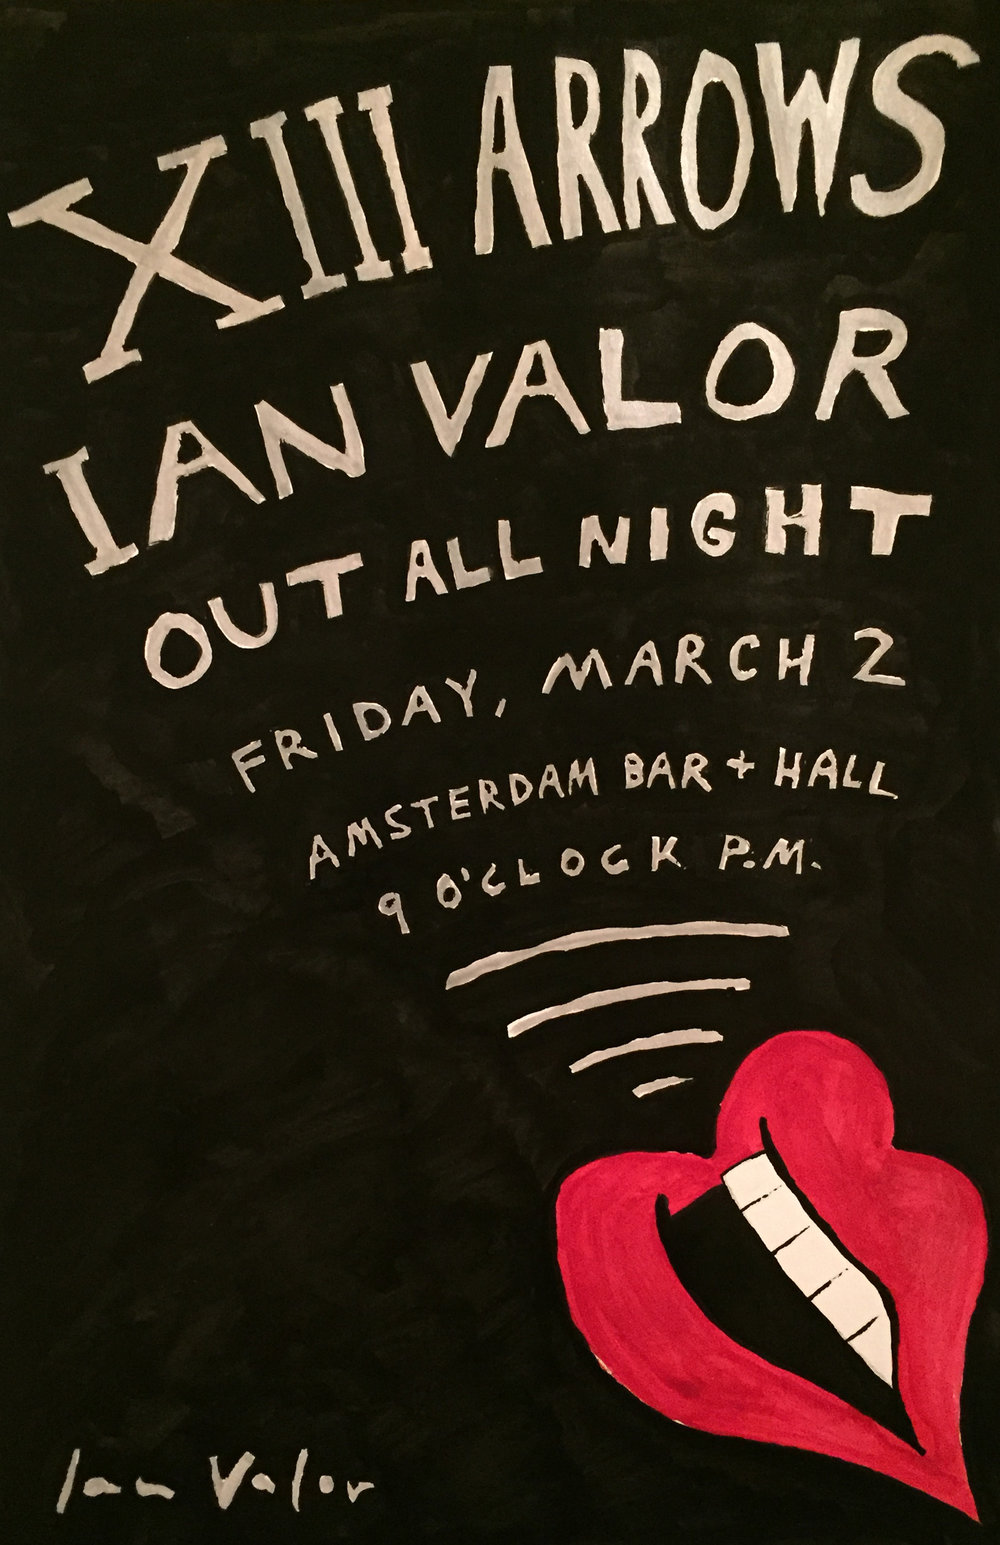 xiii-arrows-ian-valor-out-all-night-3-2-18.jpg